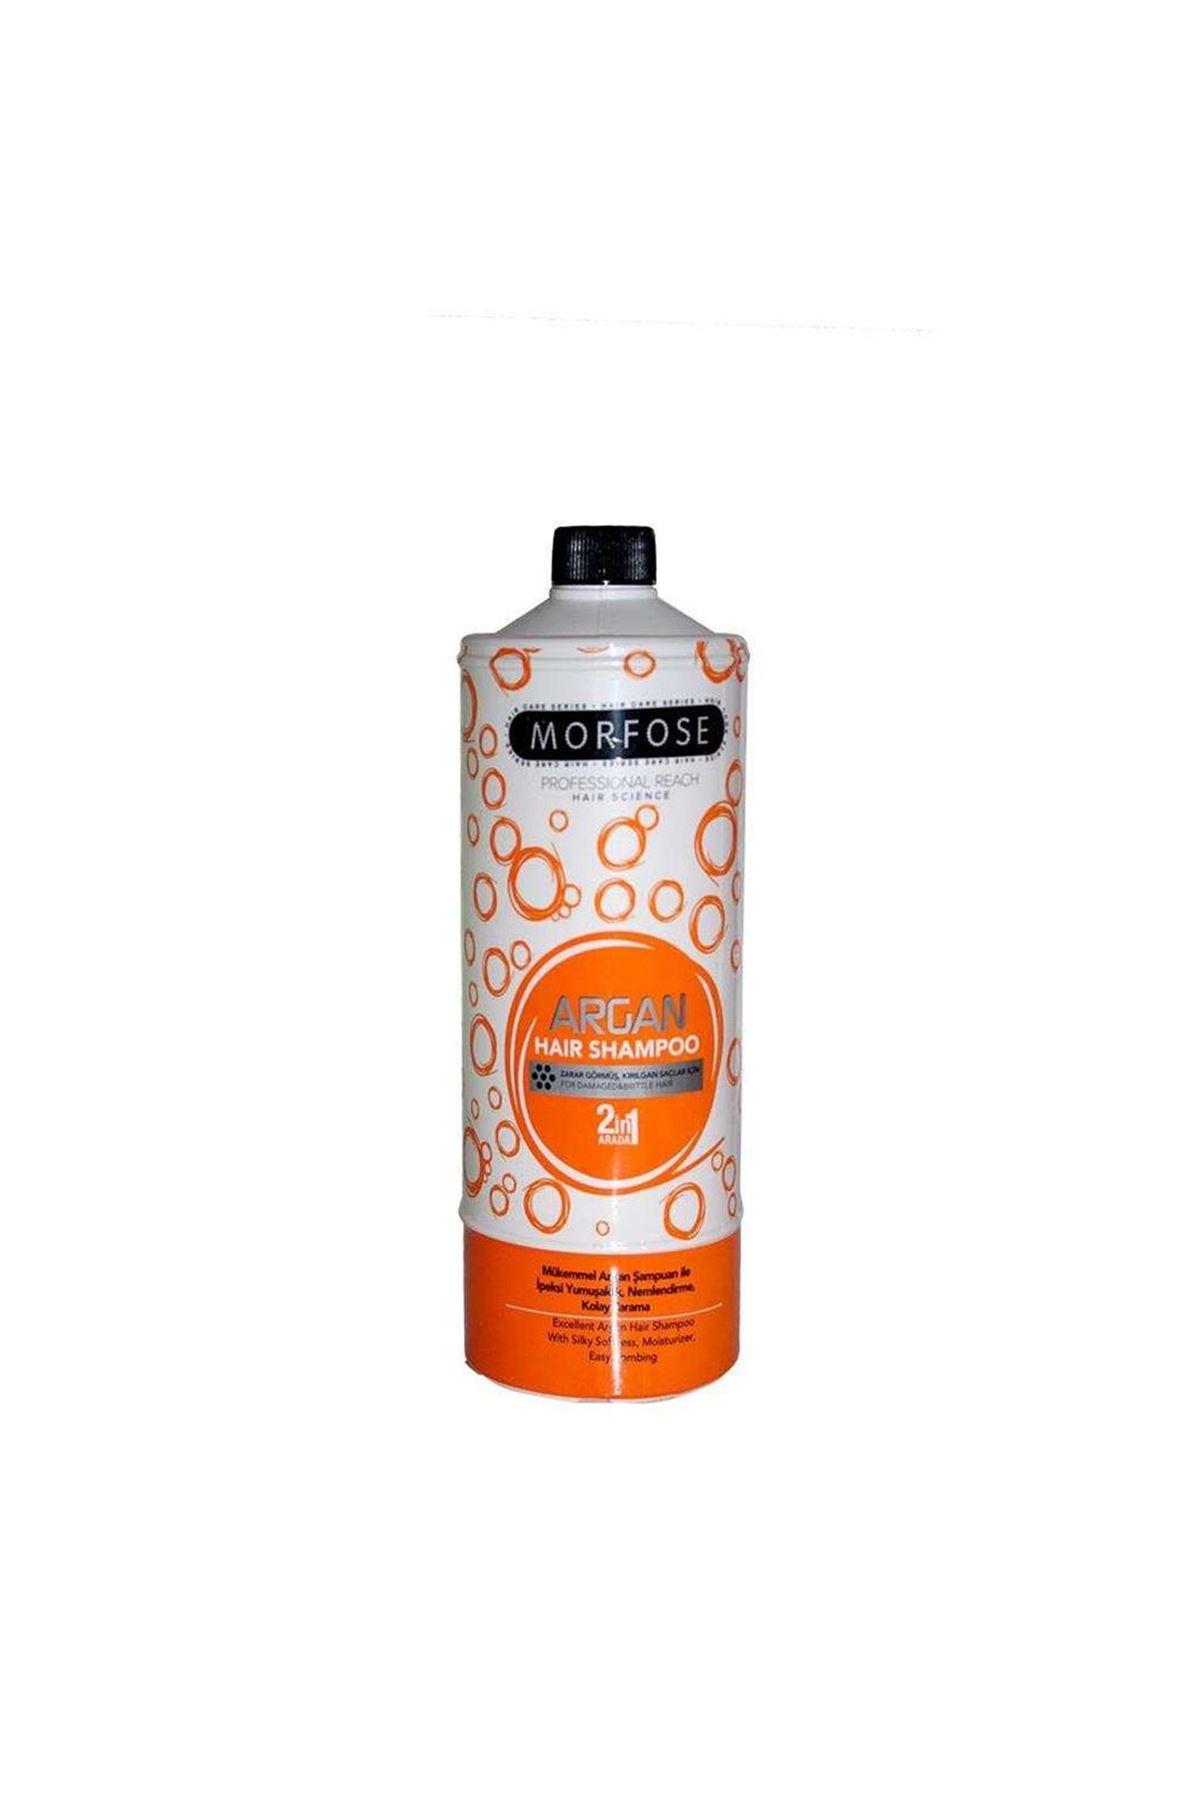 Morfose Argan Şampuan 1000ml. 2in1